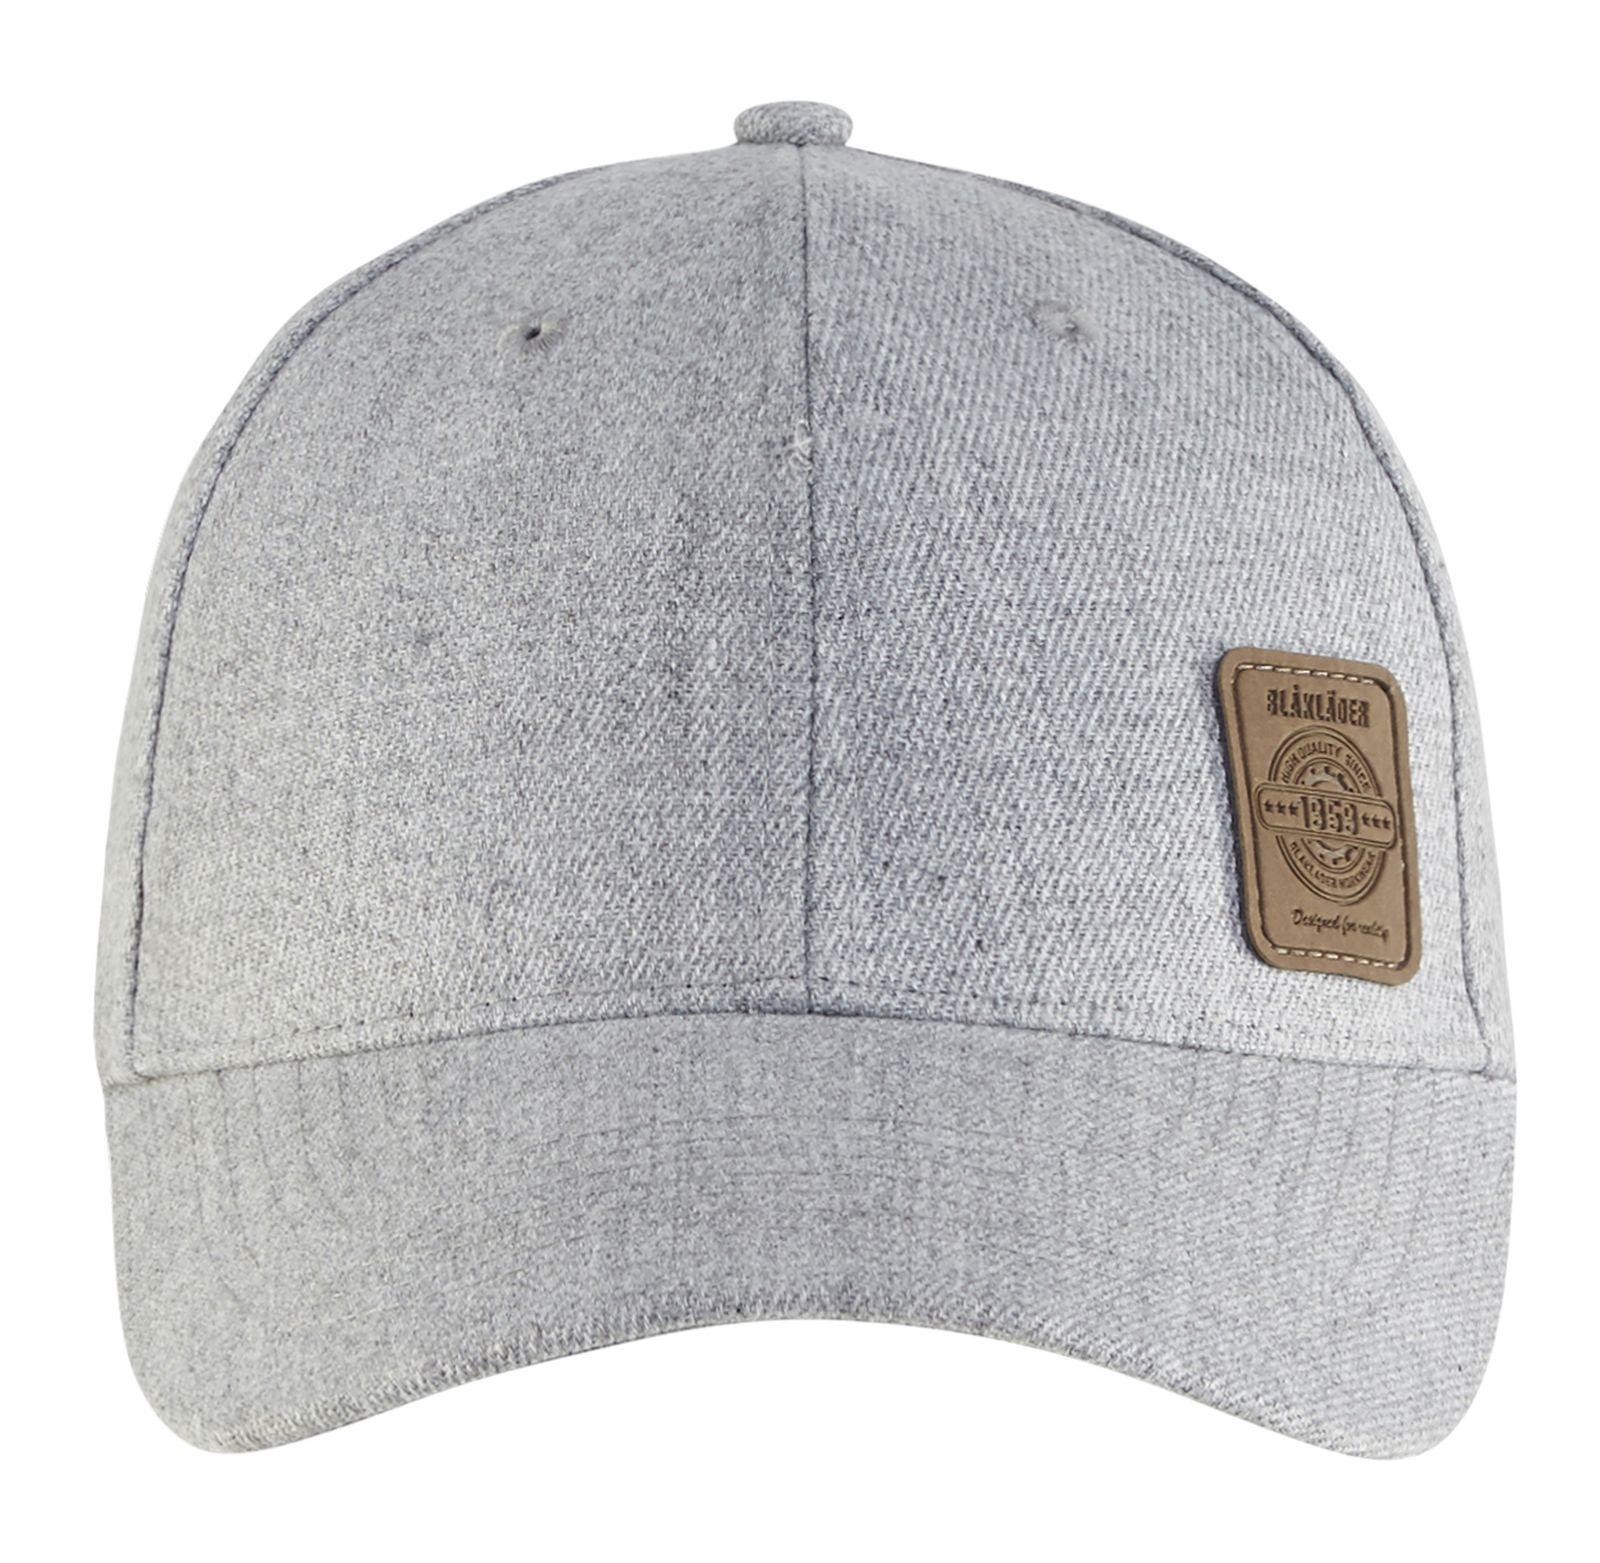 Blaklader Caps 20532870 grijs melee(9000)